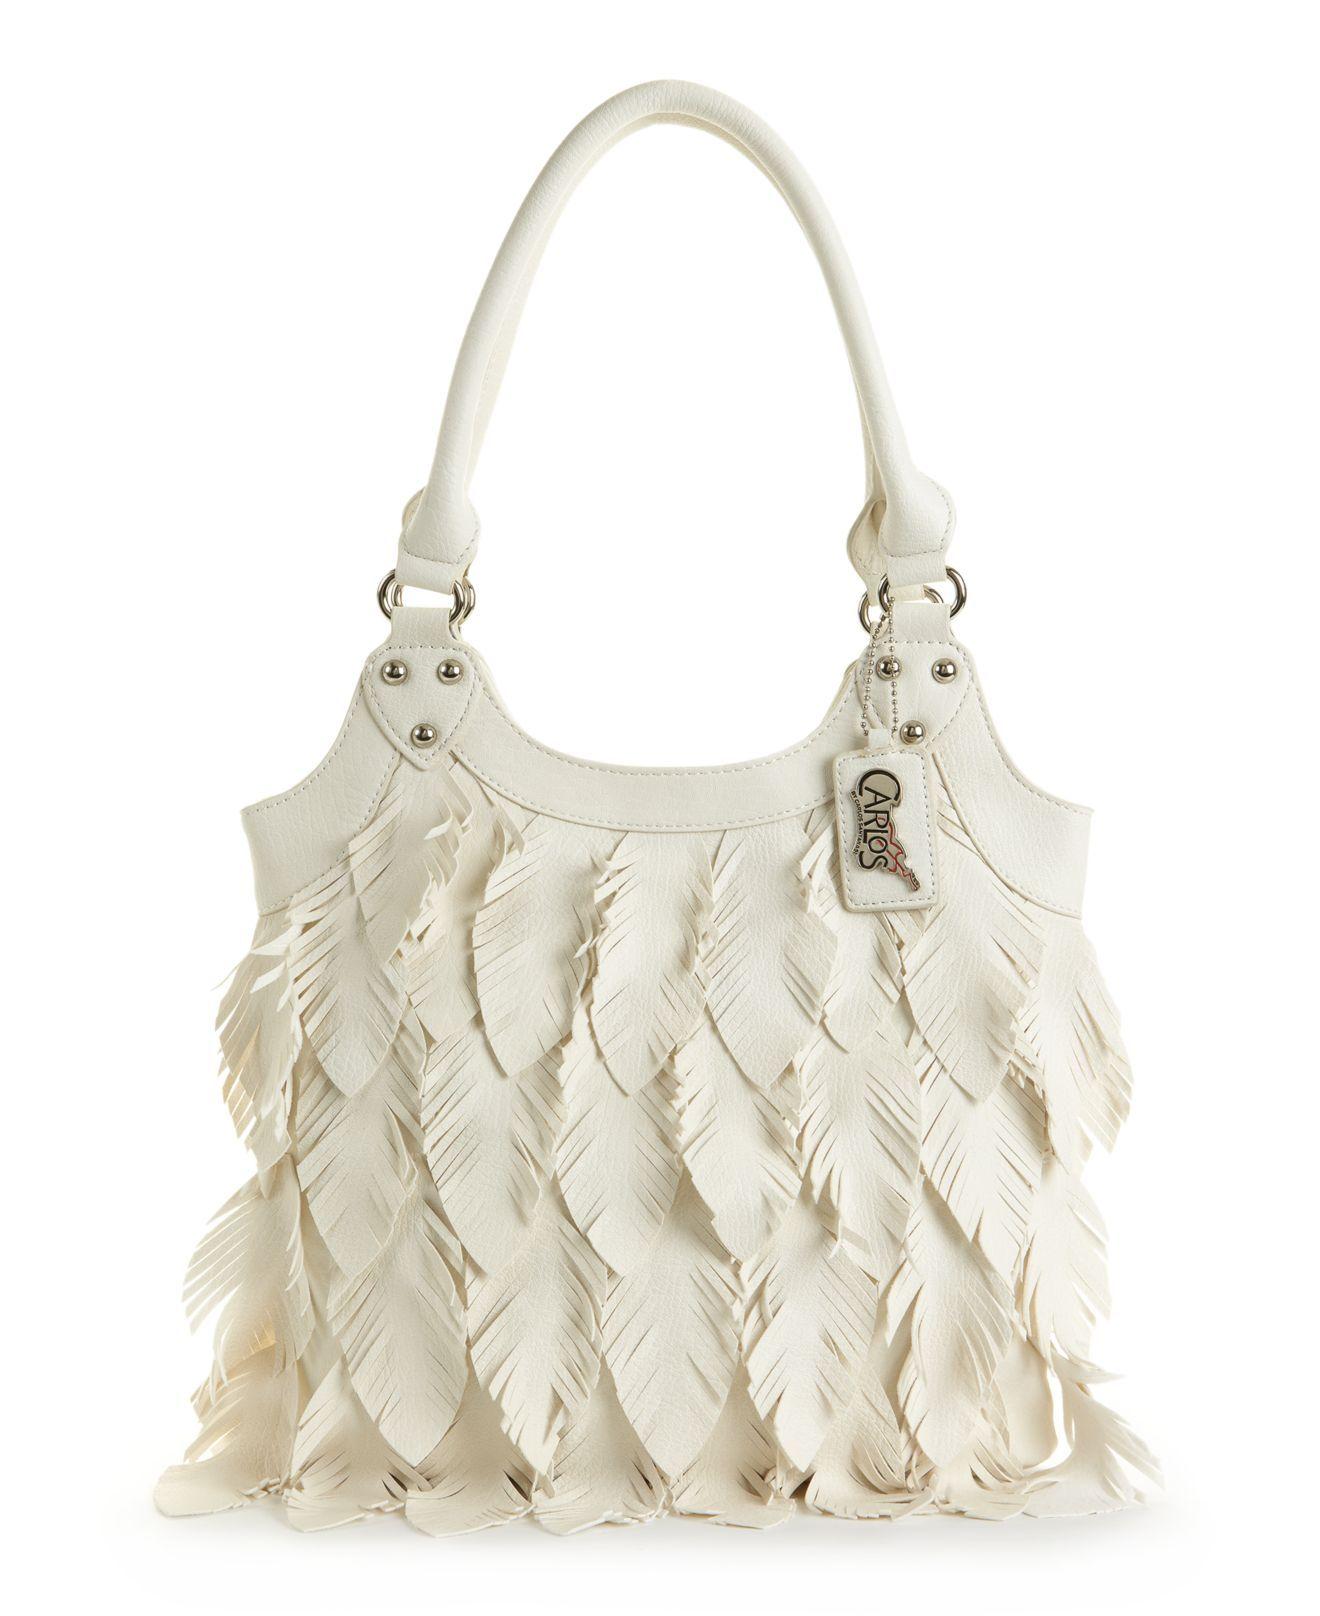 Carlos By Santana Handbag Macy S Love His Music Bags